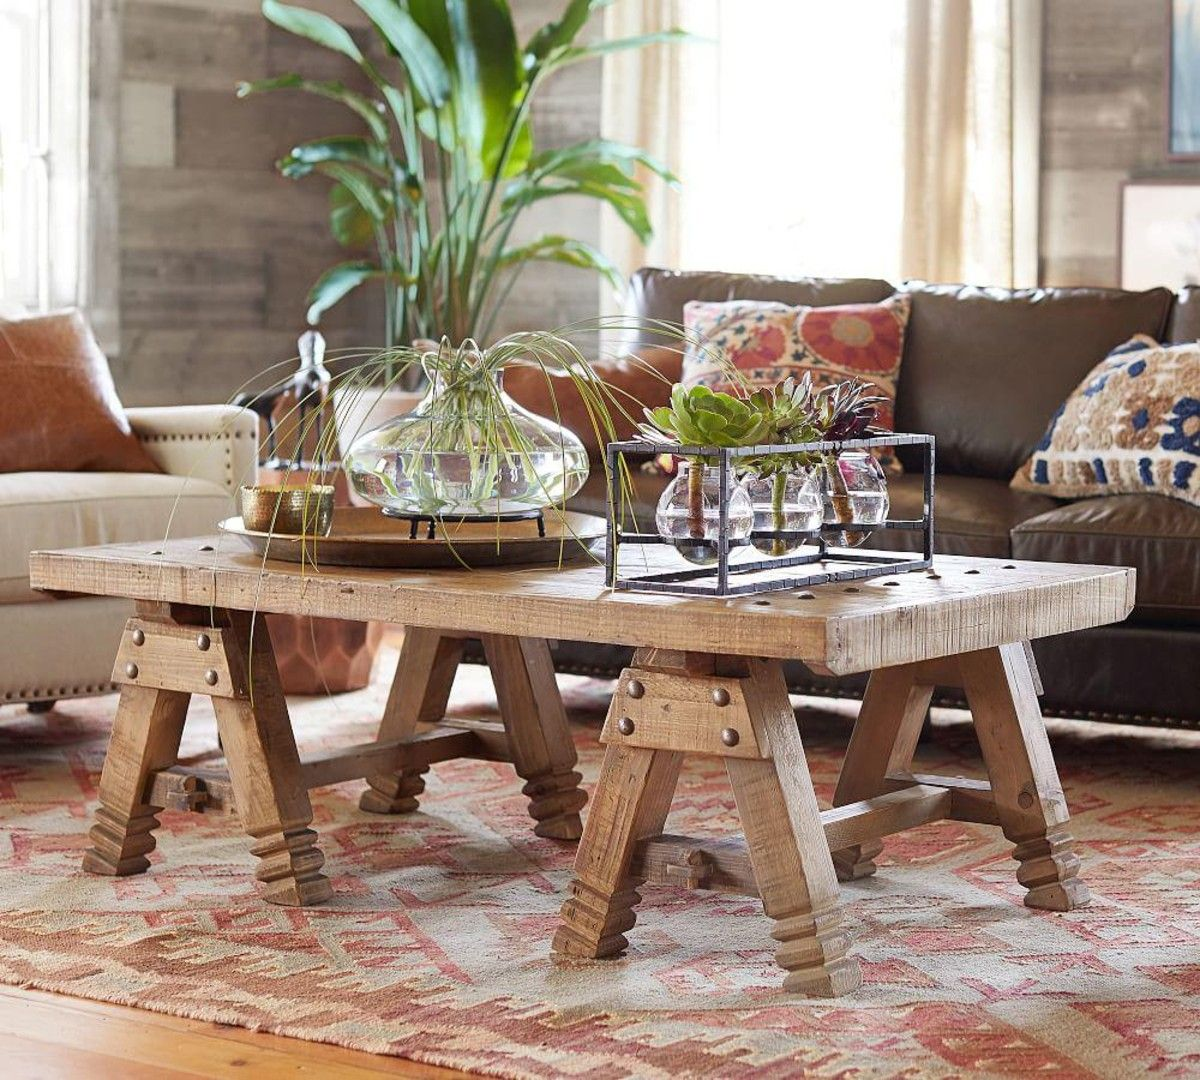 Pin by walaa aly on Indoor Plants & Arrangements Coffee